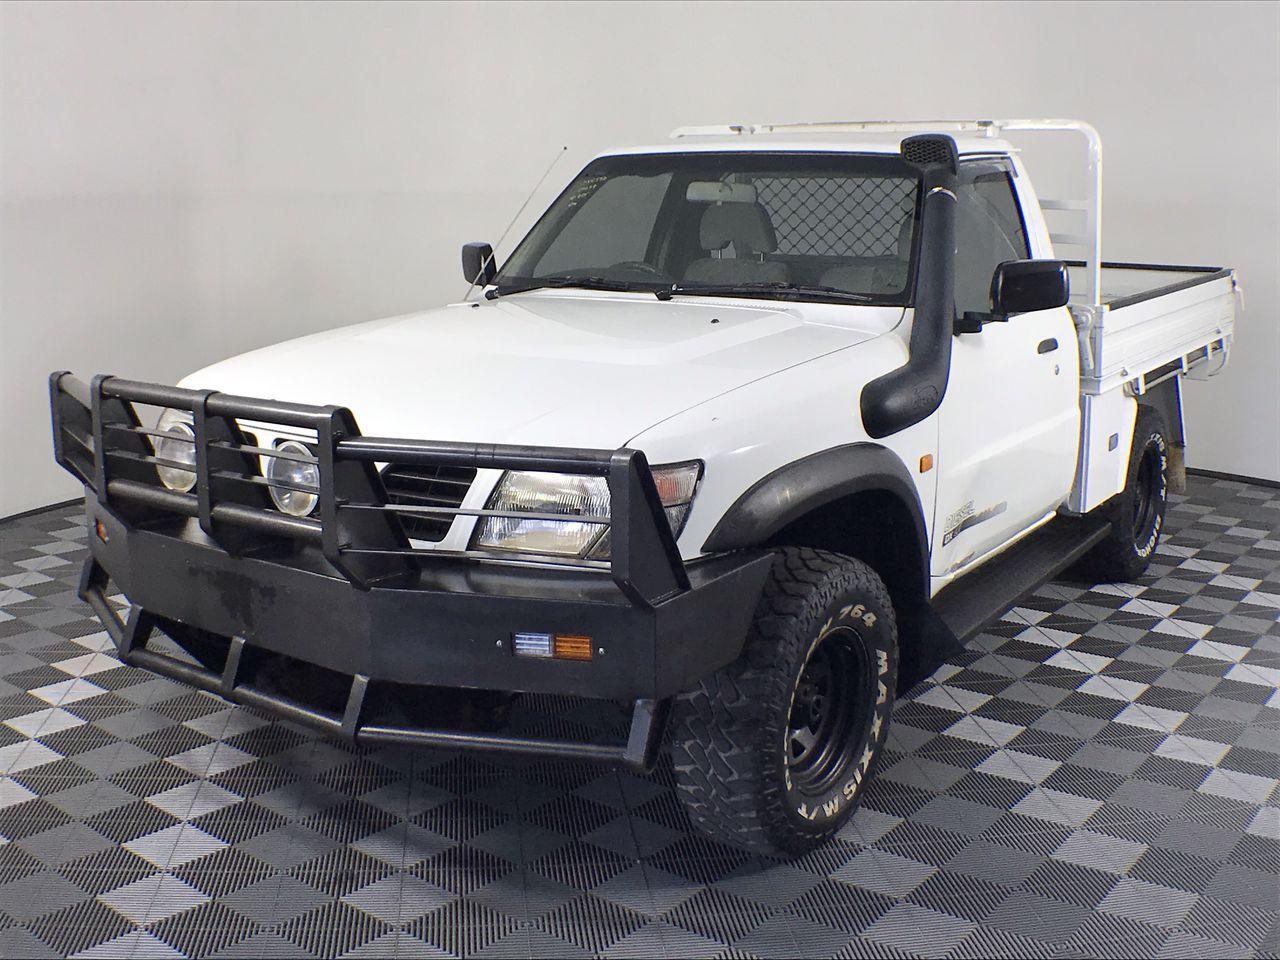 Nissan Patrol DX (4x4) GU Manual Cab Chassis